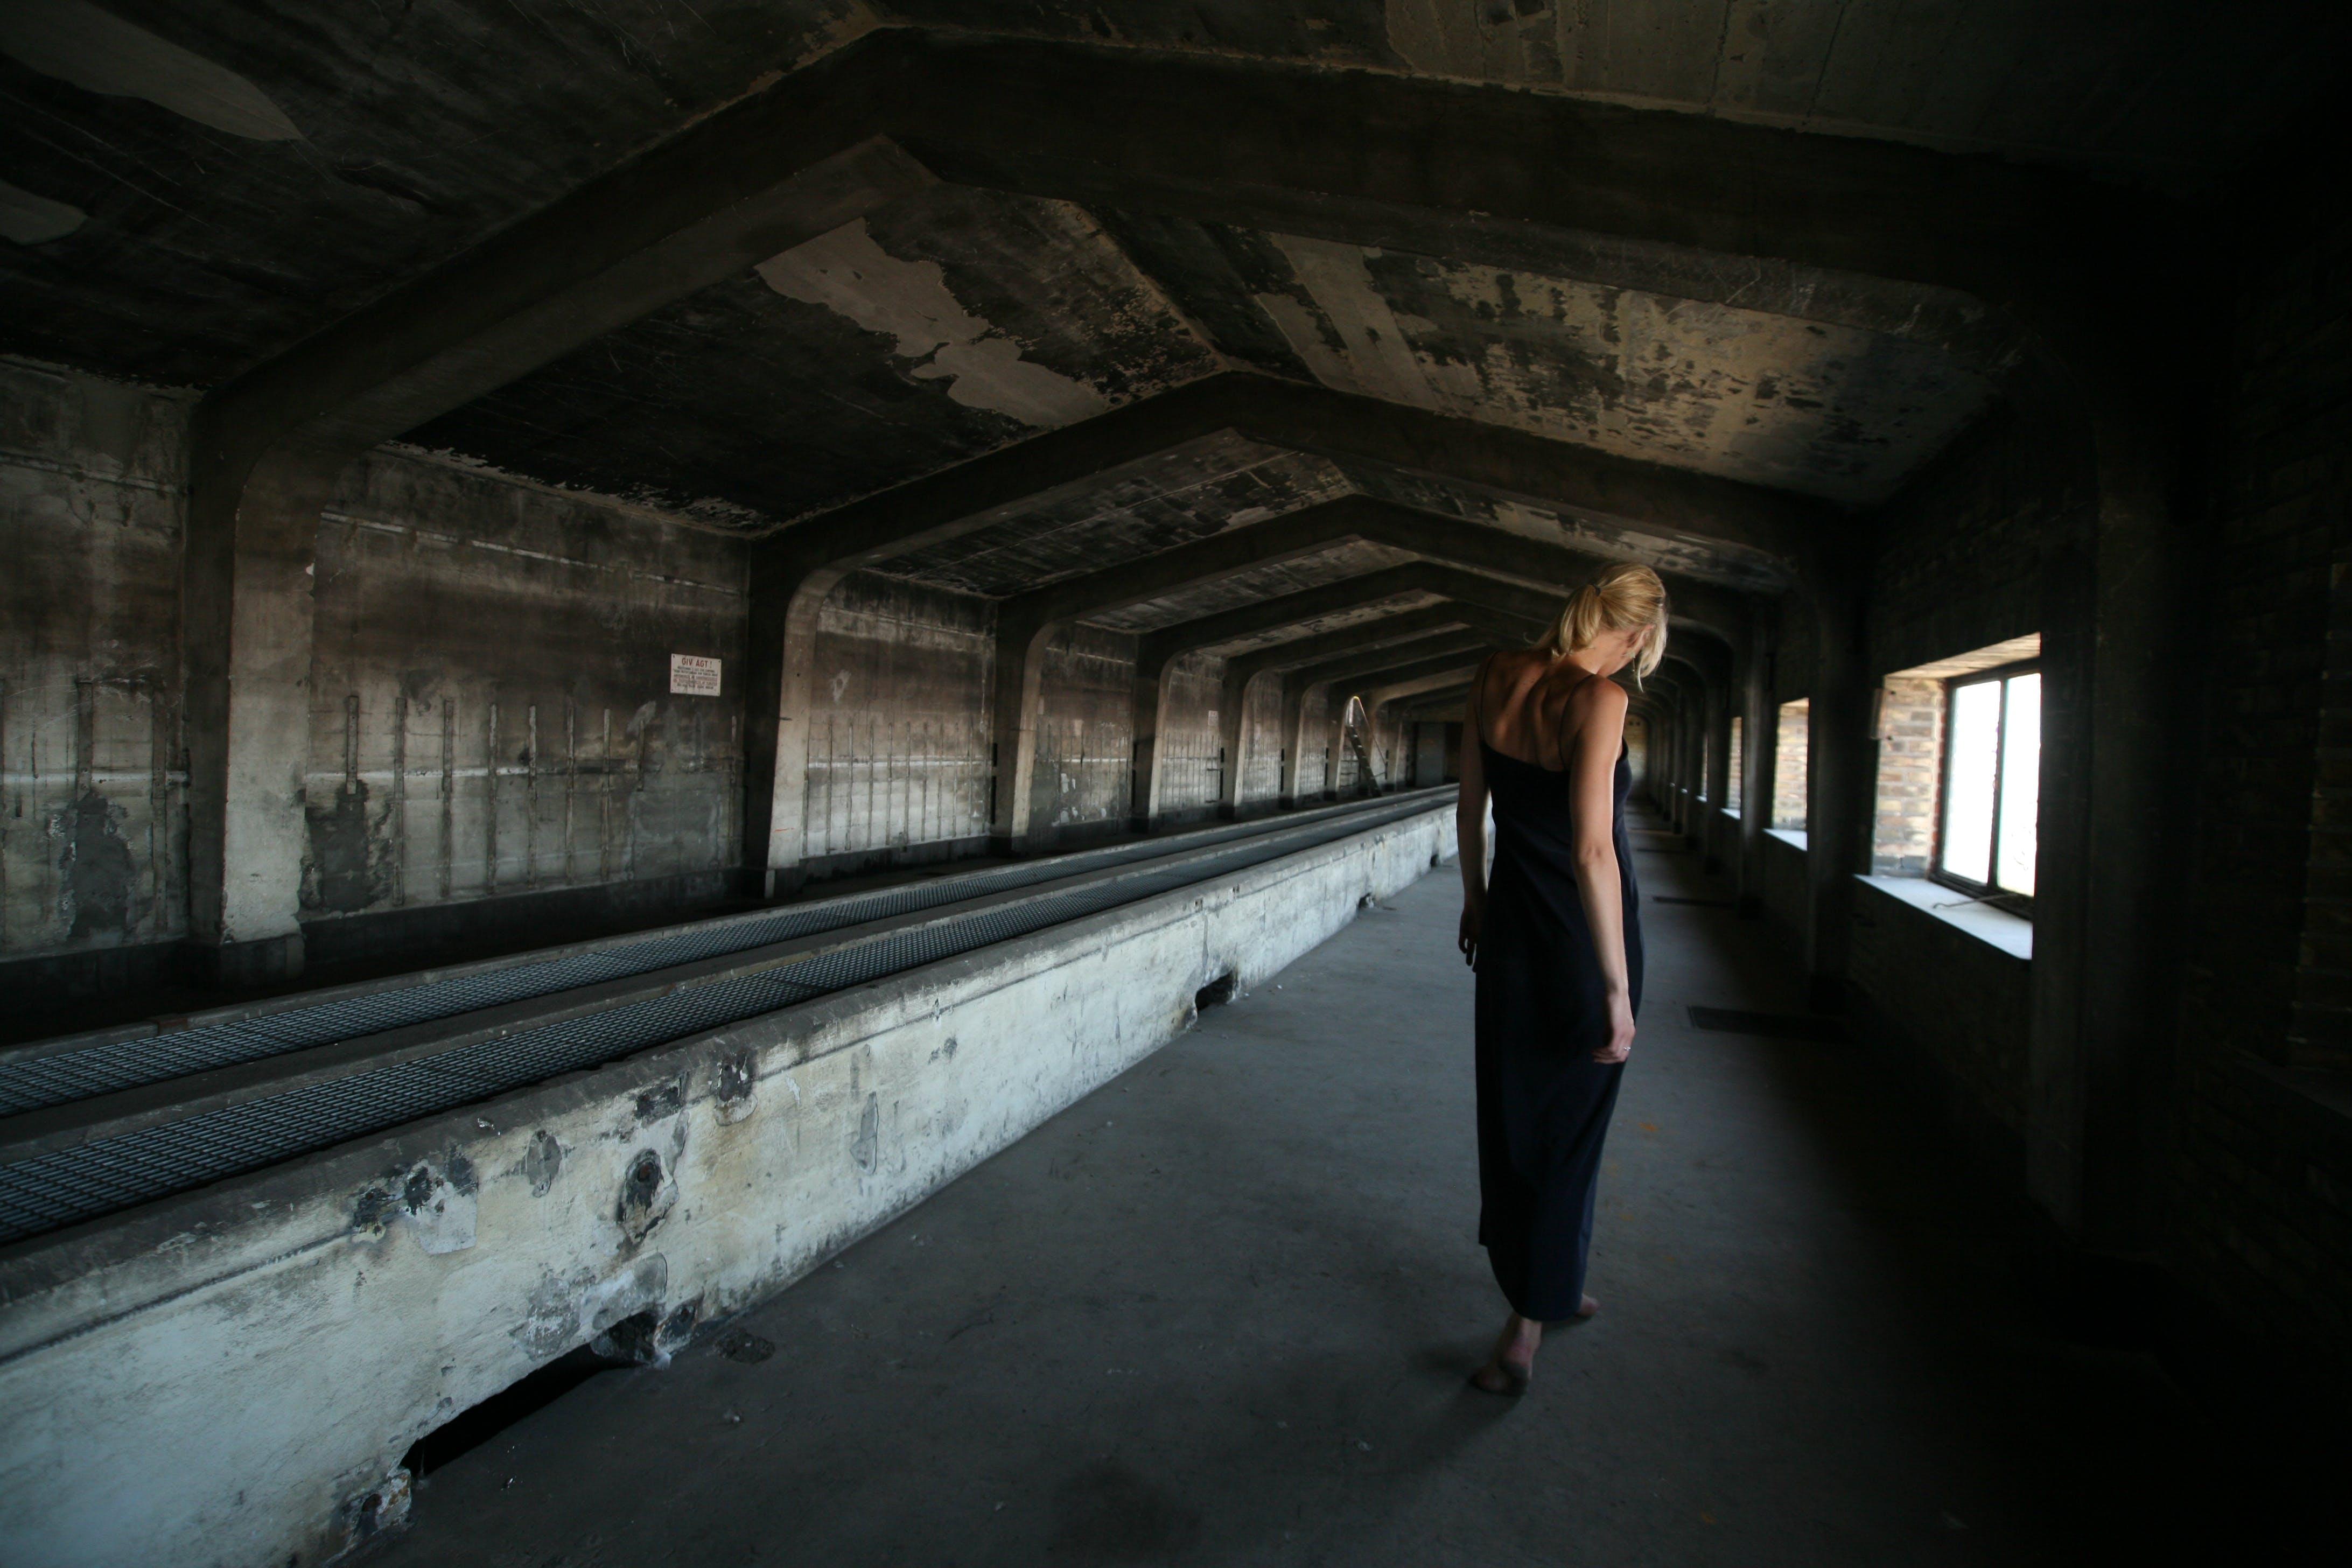 Woman Standing Inside Attic